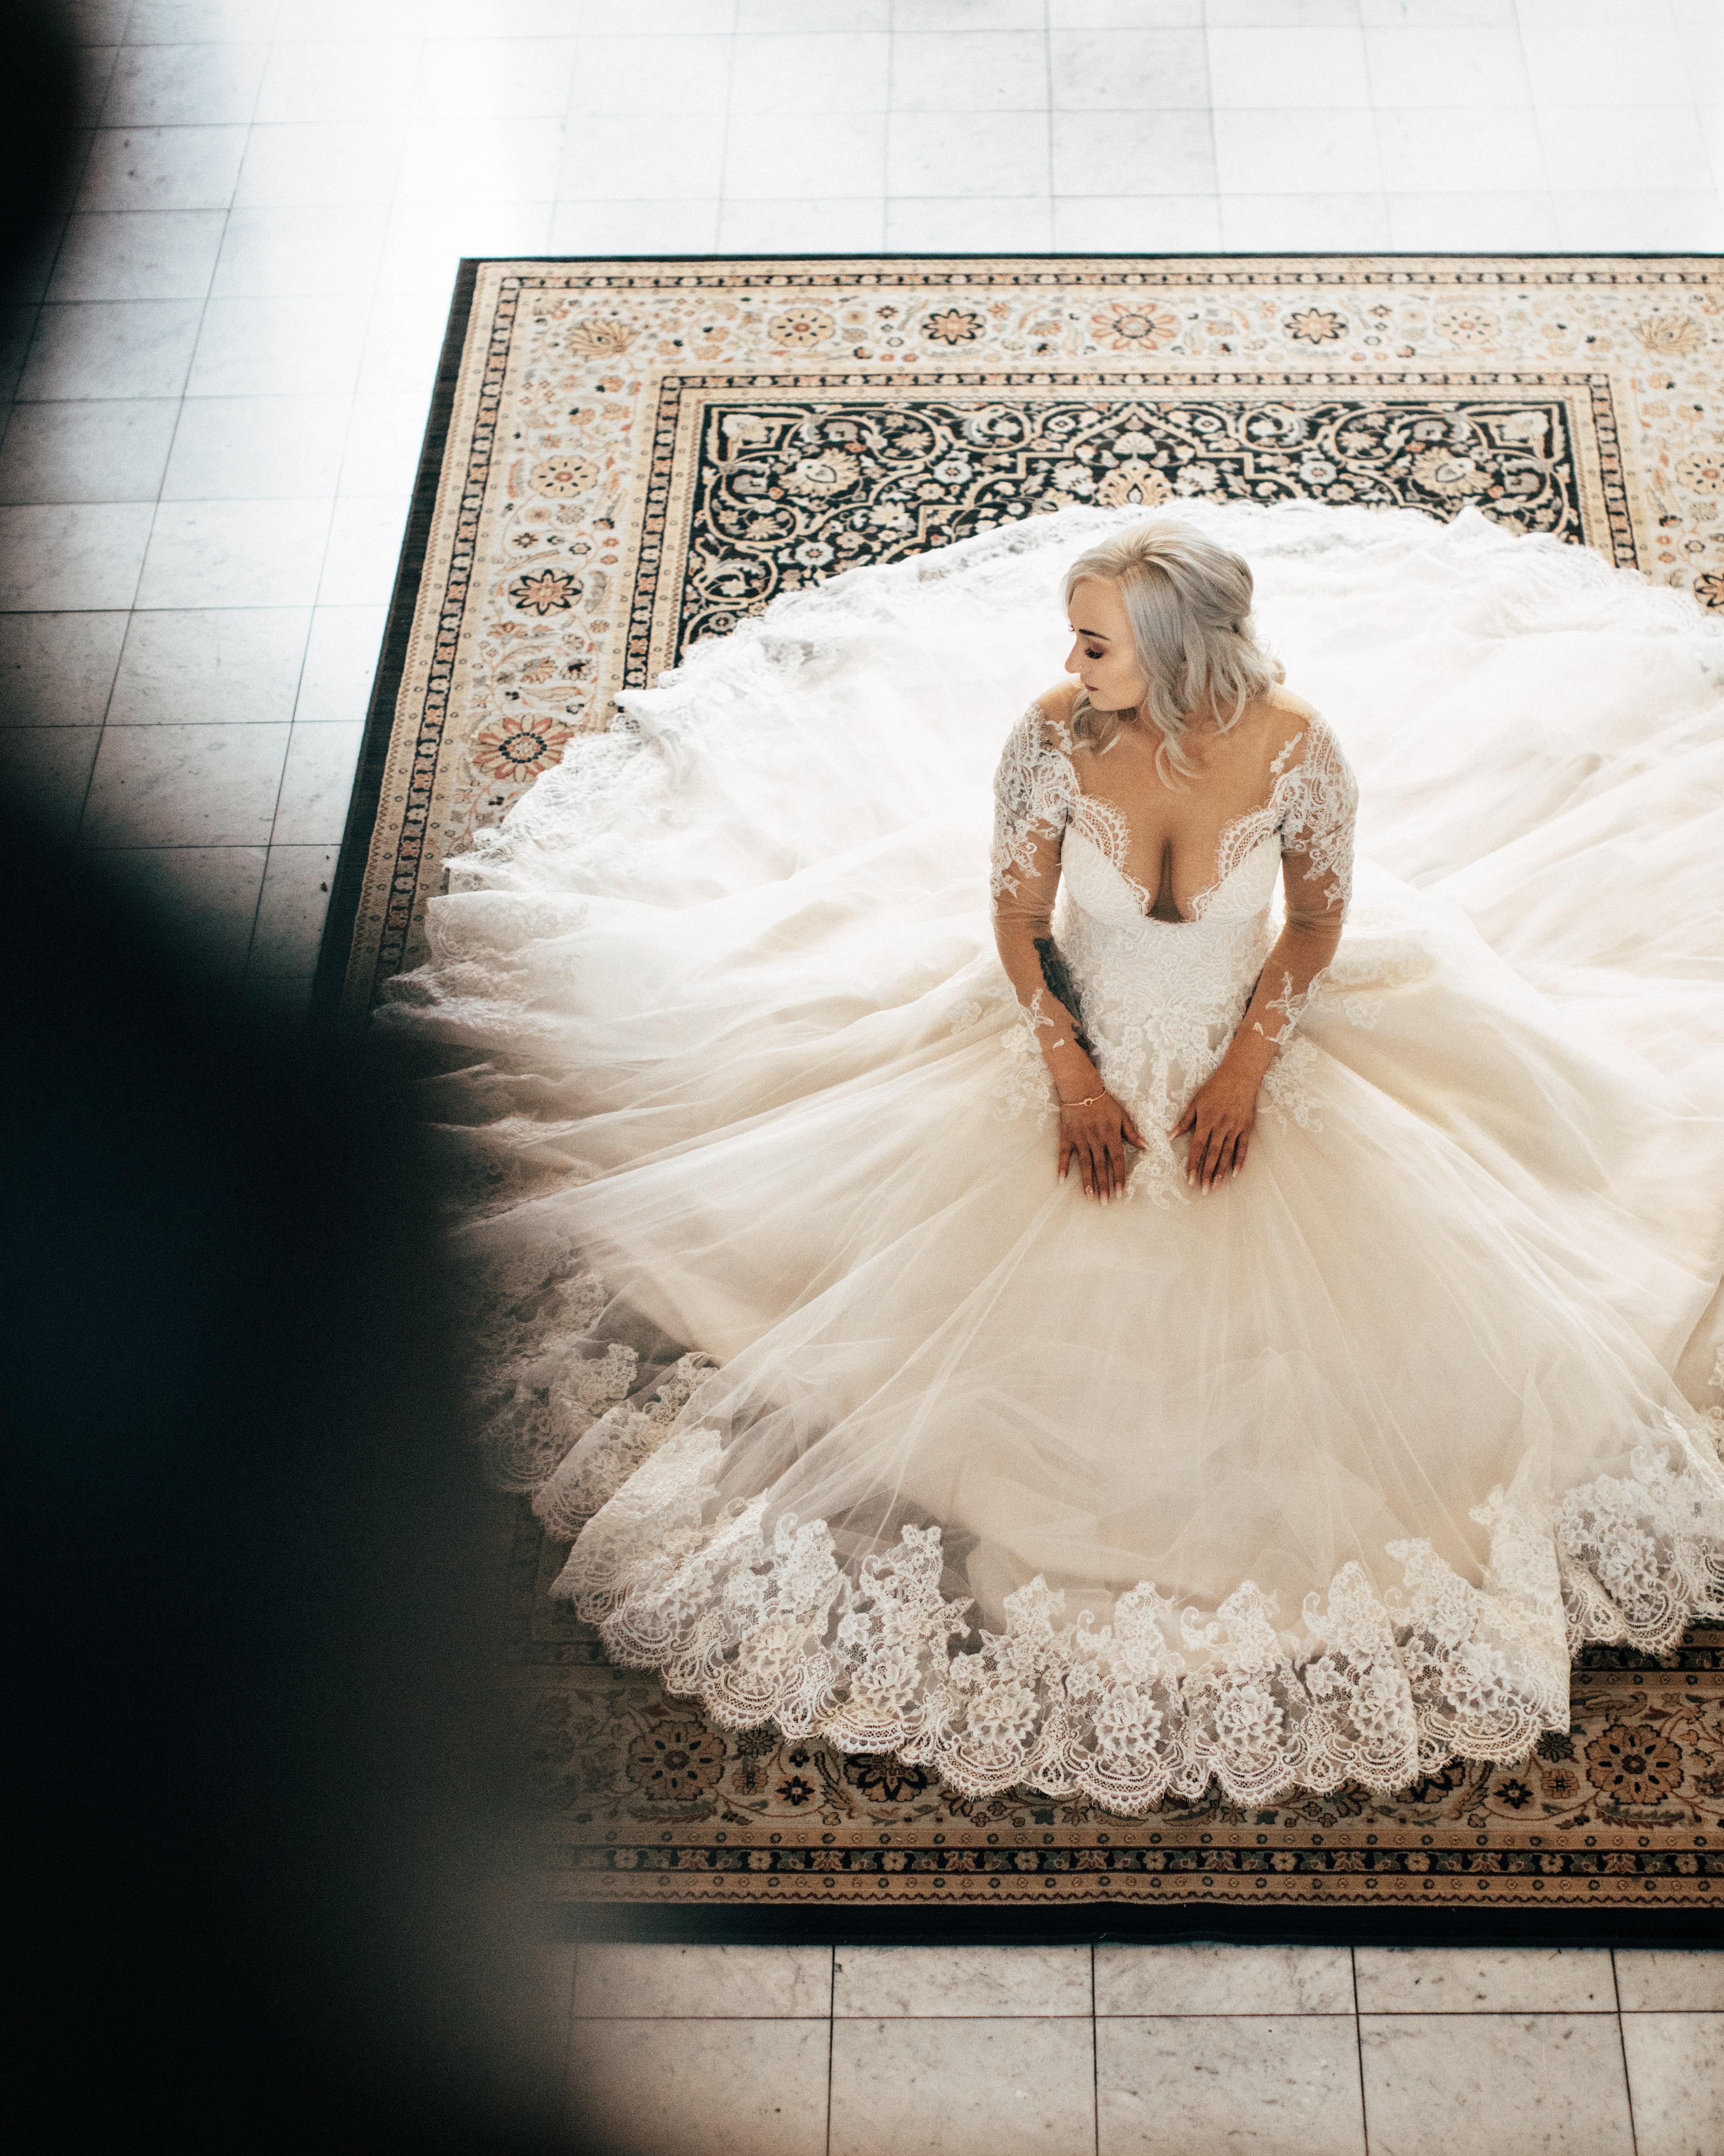 Bridal Bride Dress 1608581 Wedding Planner Brisbane Gold